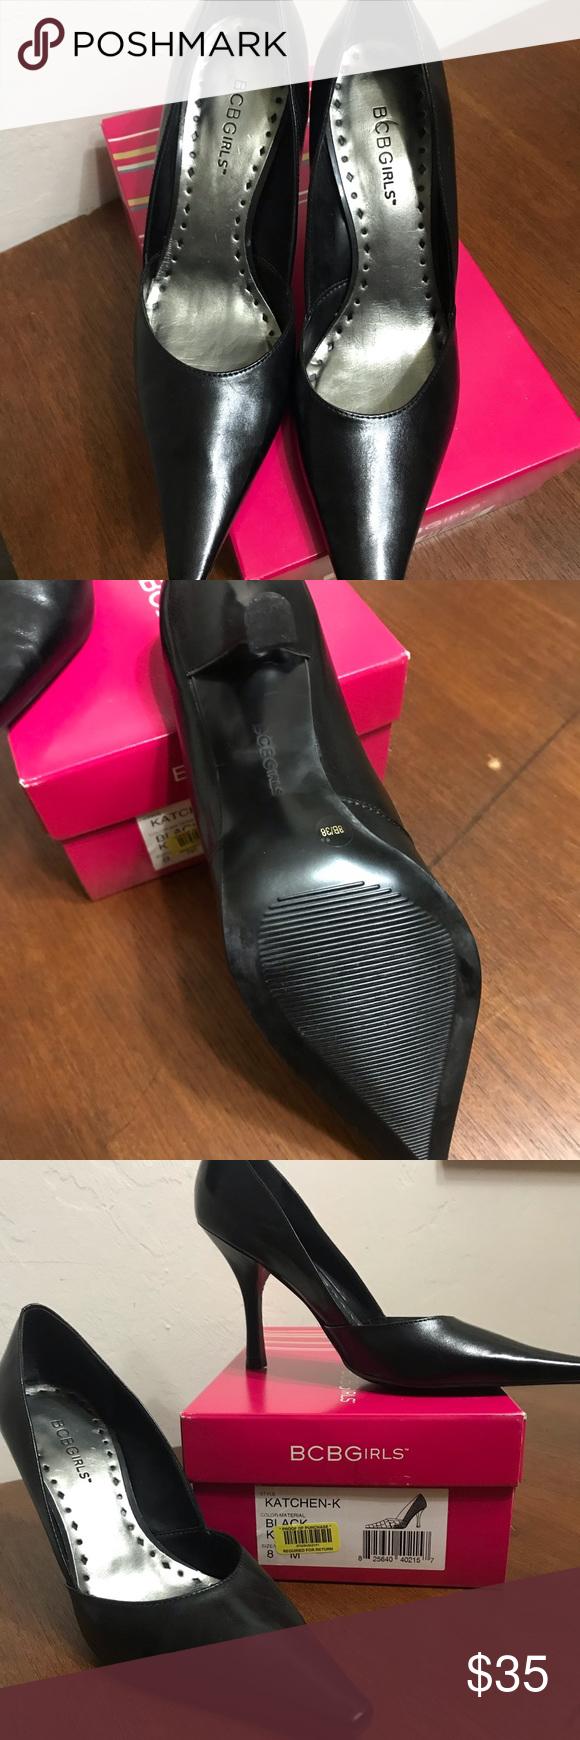 "1def20c073 BCBGirls Katchen Black Classic Pumps Heels NIB New in box. Perfect classic  heels. Heel height approximately 4"" BCBGirls Shoes Heels"